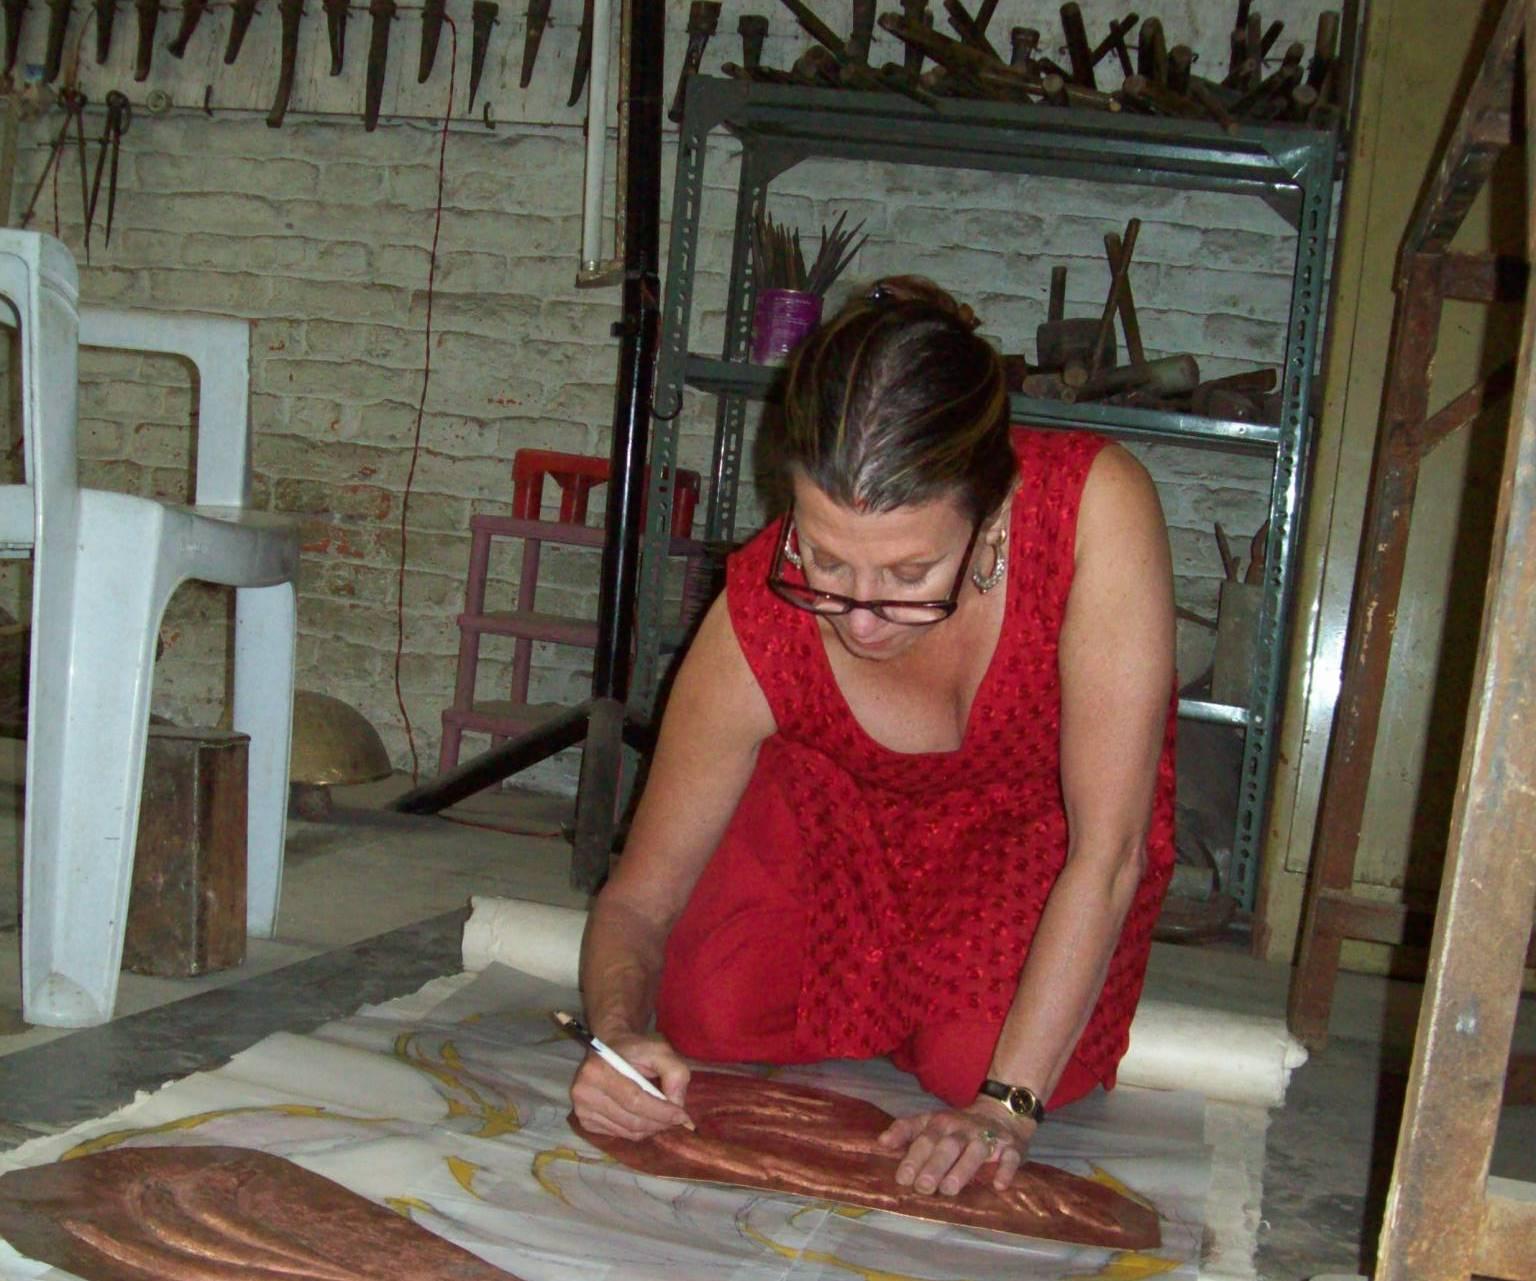 Drdak preparing repoussé for gilding at Shakya's atelier in 2012.